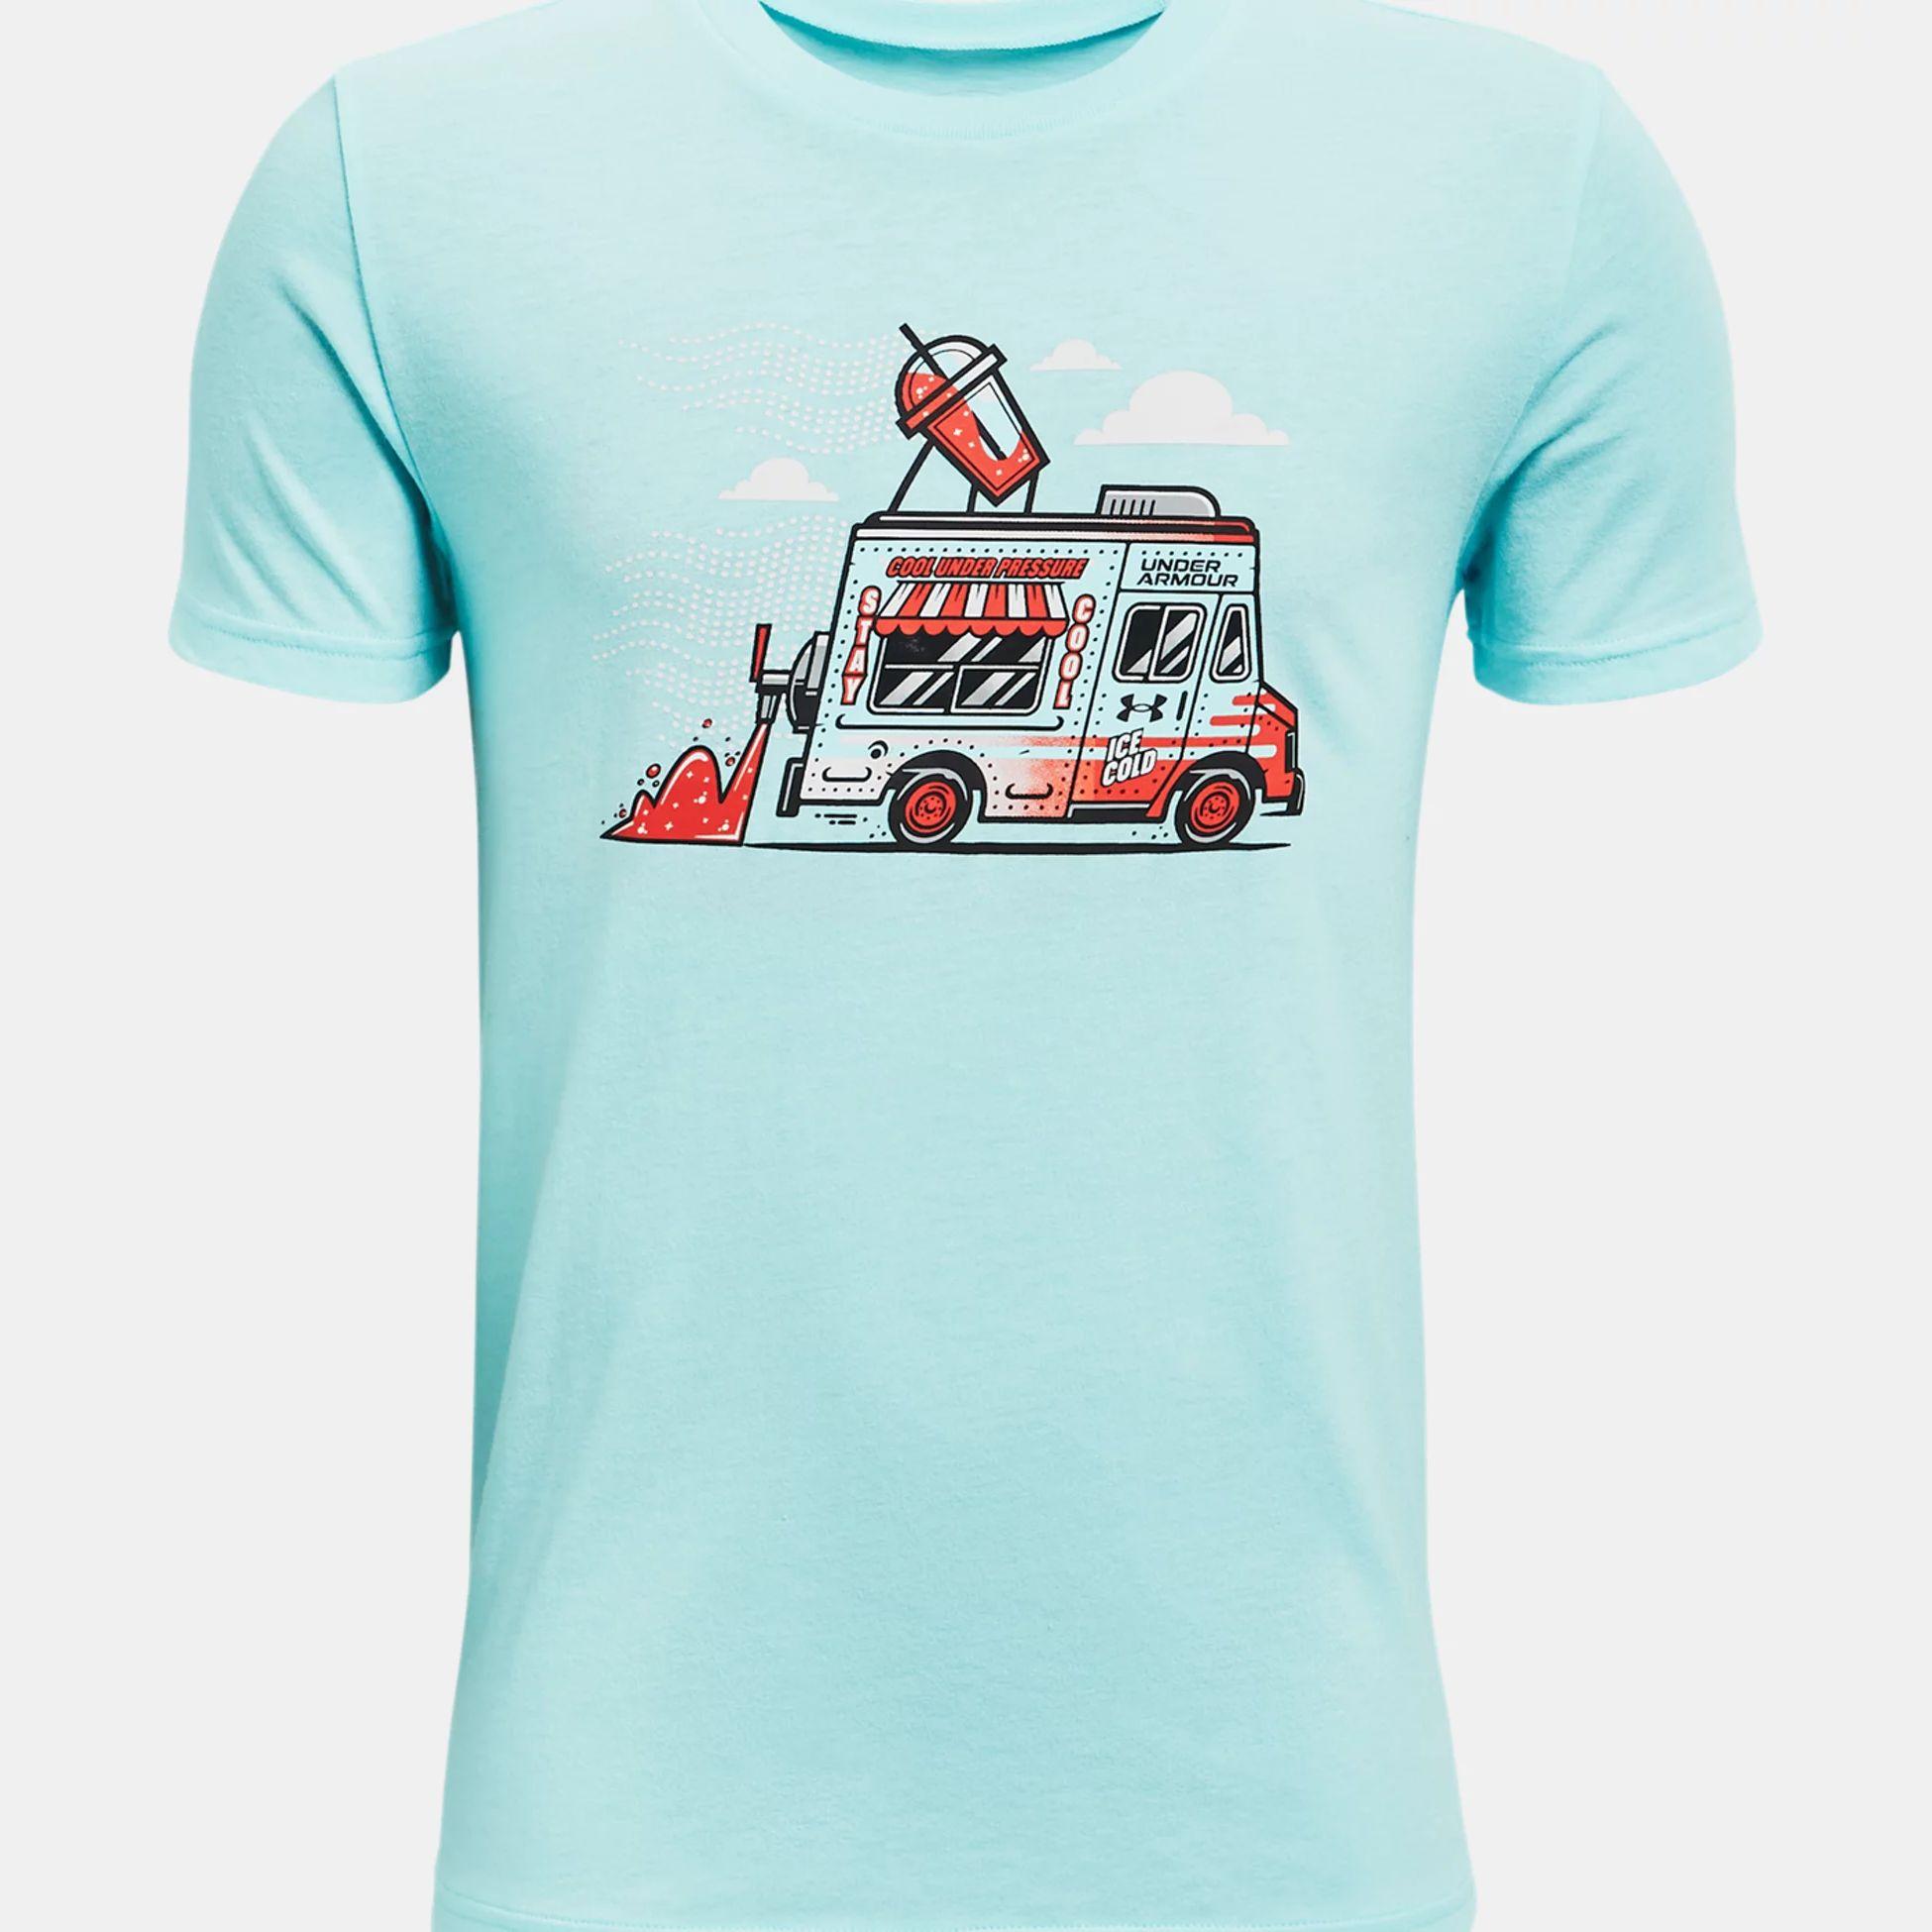 Clothing -  under armour SP Ice Cream Truck Short Sleeve